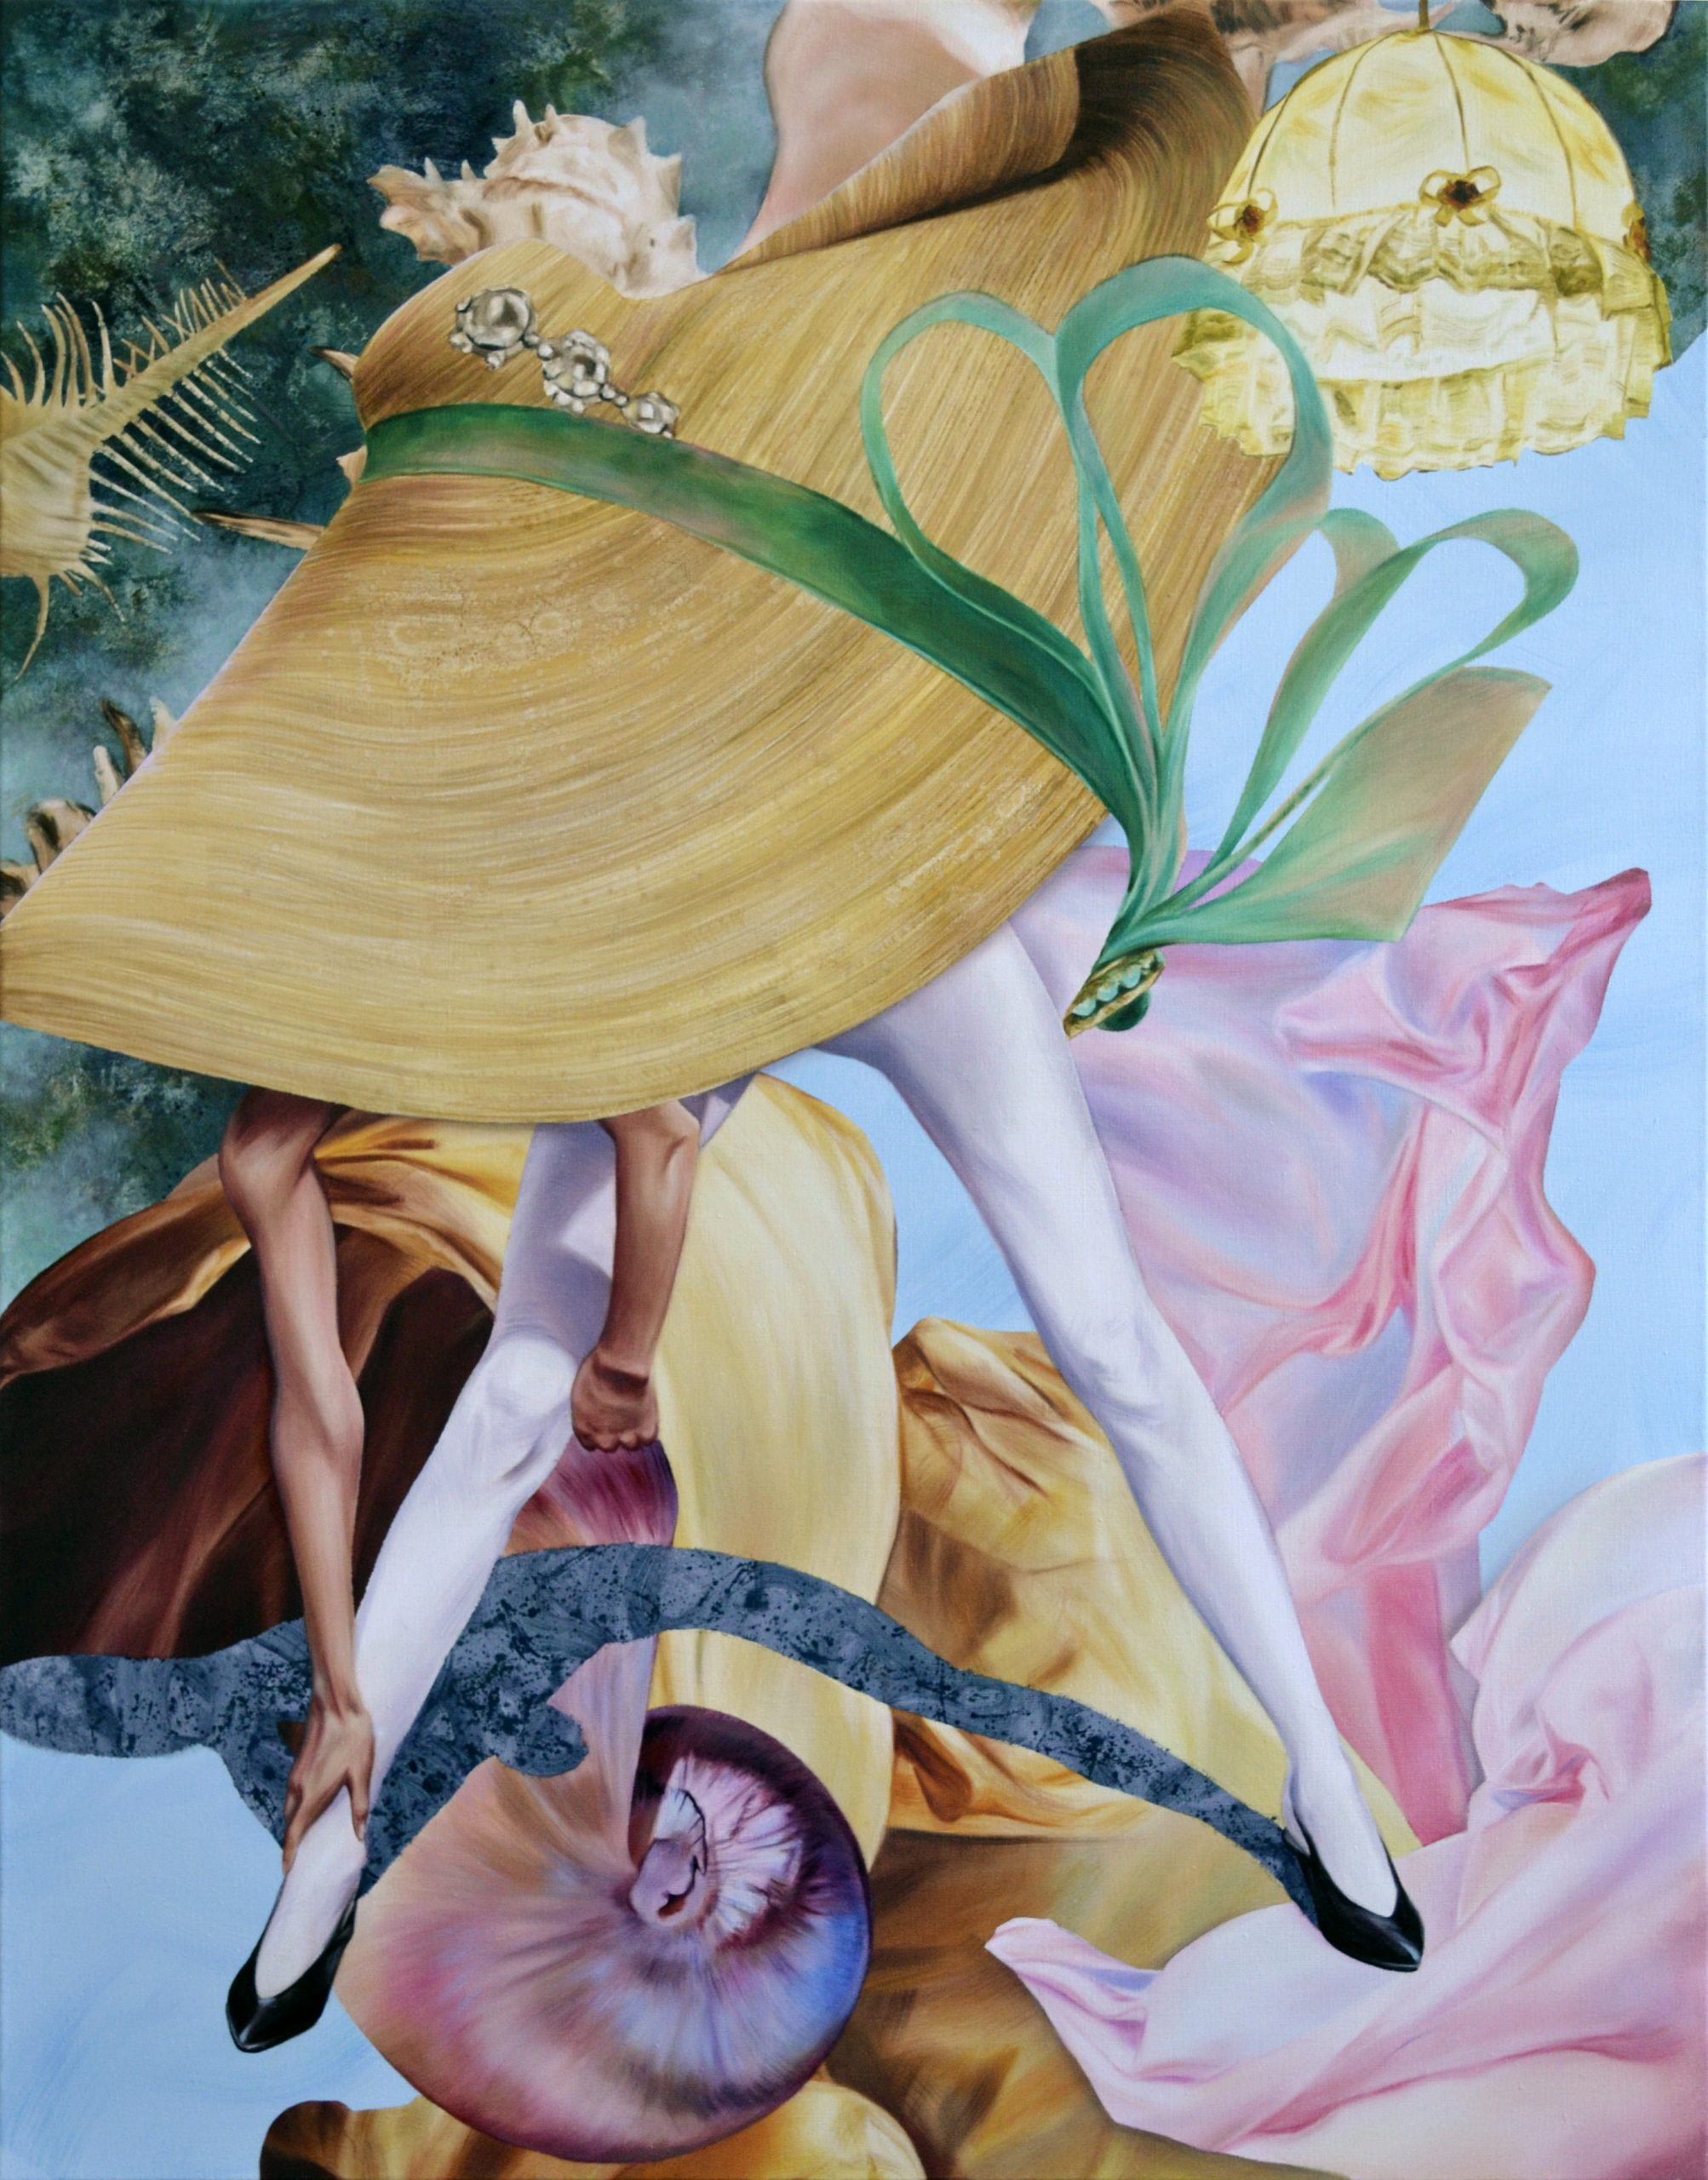 Martyna Borowiecka. Summer's remains. 140 x 110 cm. 2019.